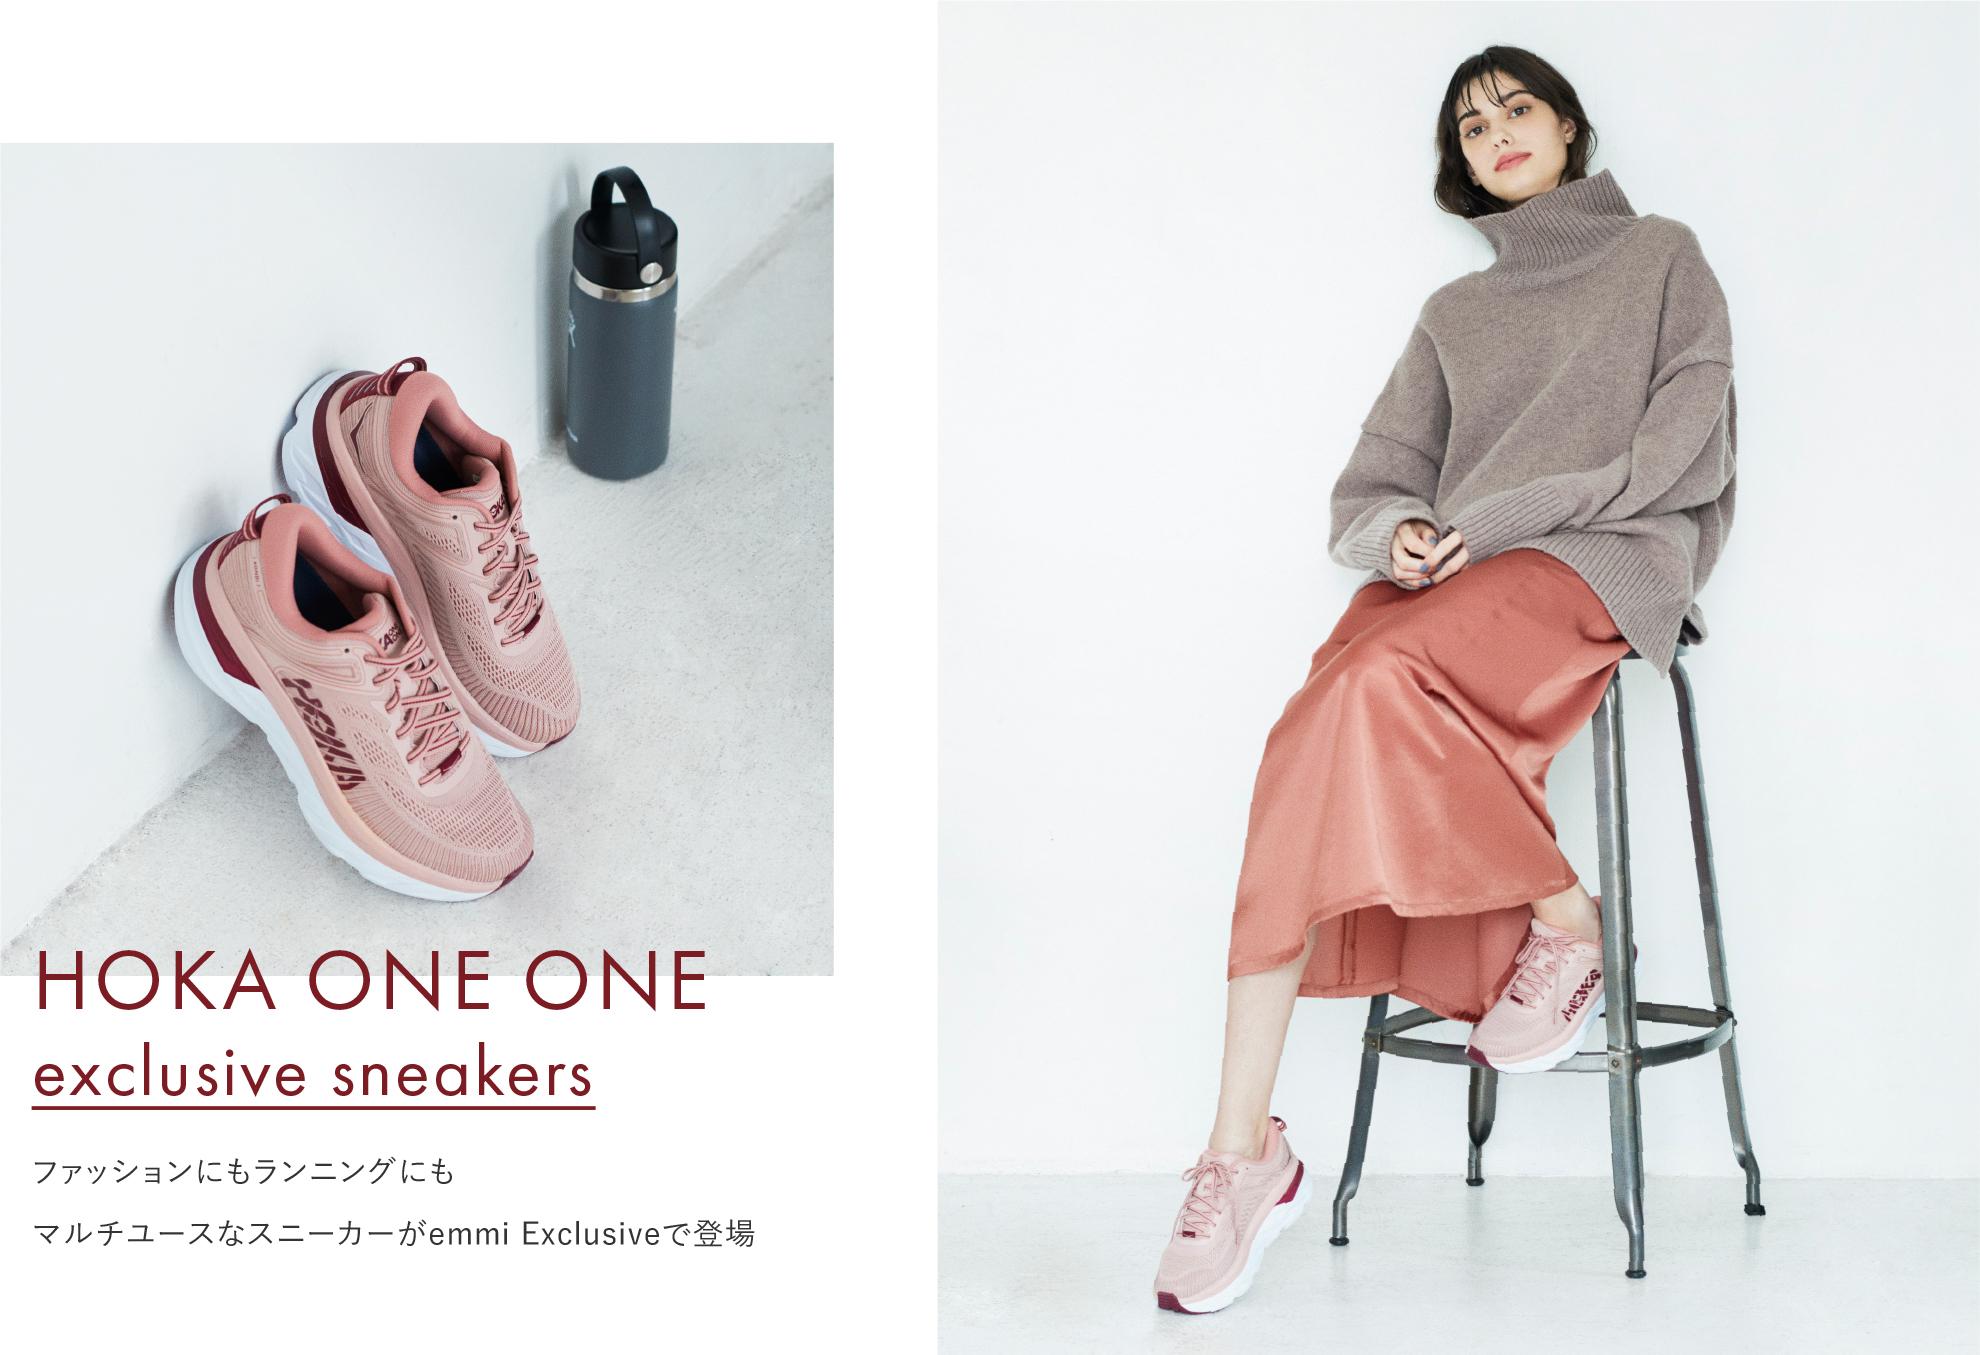 HOKA ONE ONE exclusive sneakers ファッションにもランニングにも マルチユースなスニーカーがemmi Exclusiveで登場